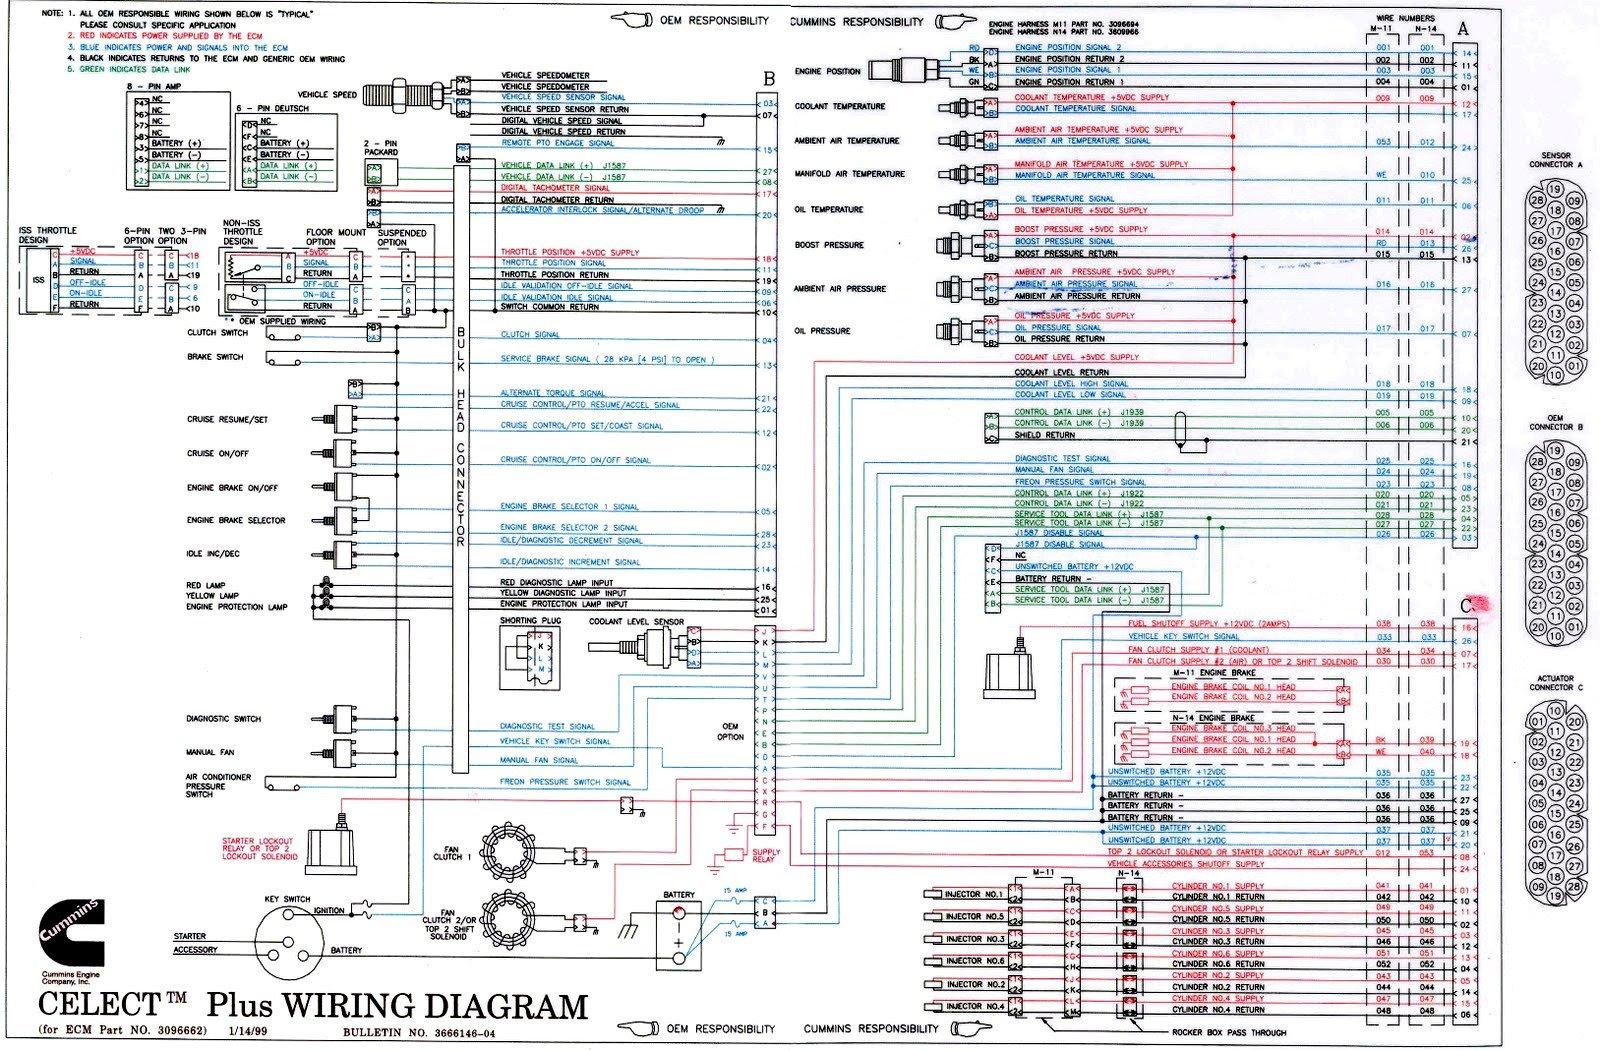 07 dodge ram 3500 wiring harness image 5